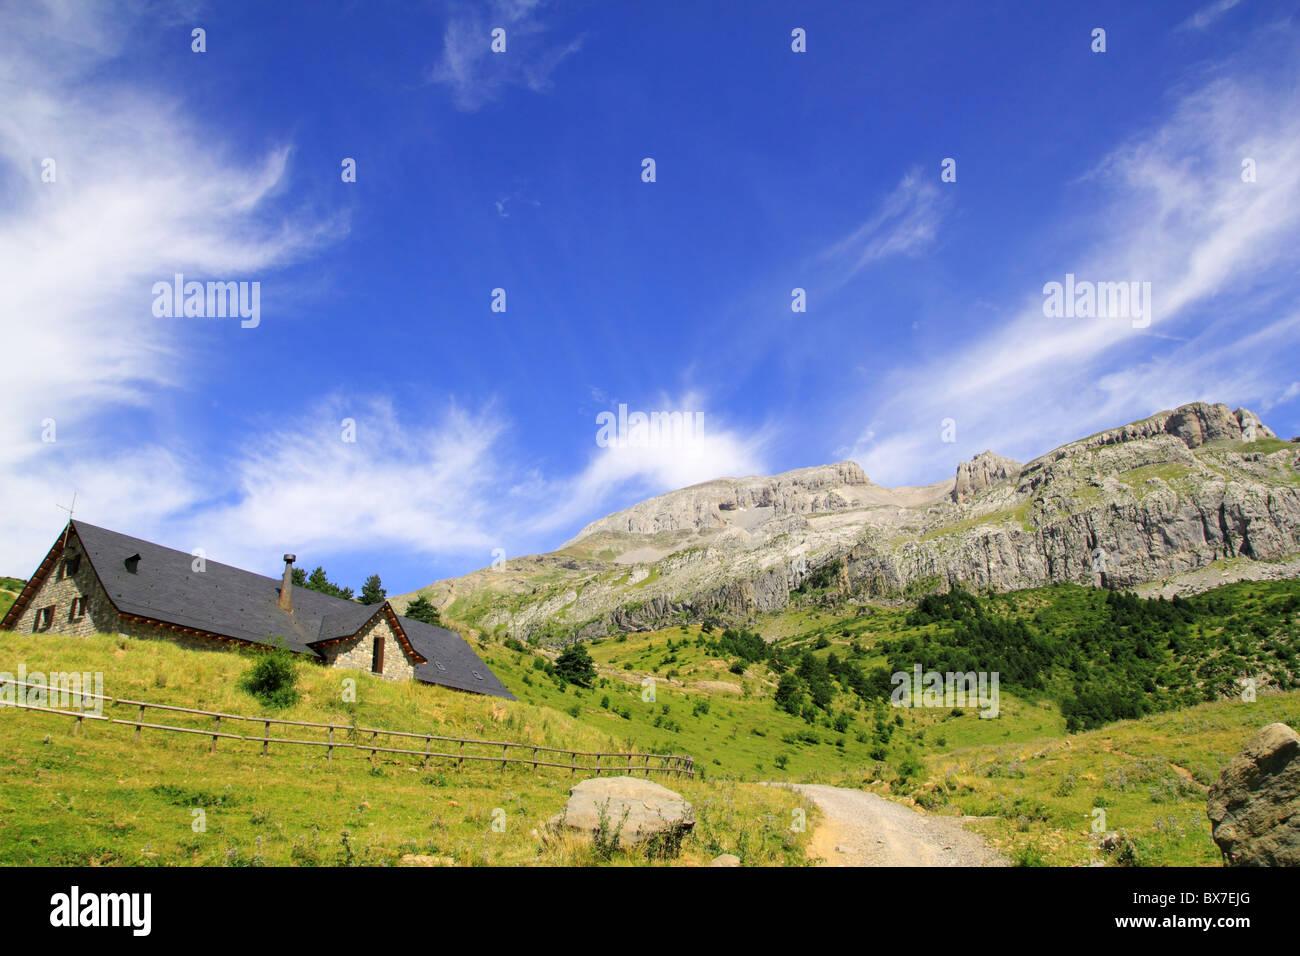 Bisaurin peak Lizara Aragues del Puerto mountain retreat Pyrenees Huesca Spain - Stock Image